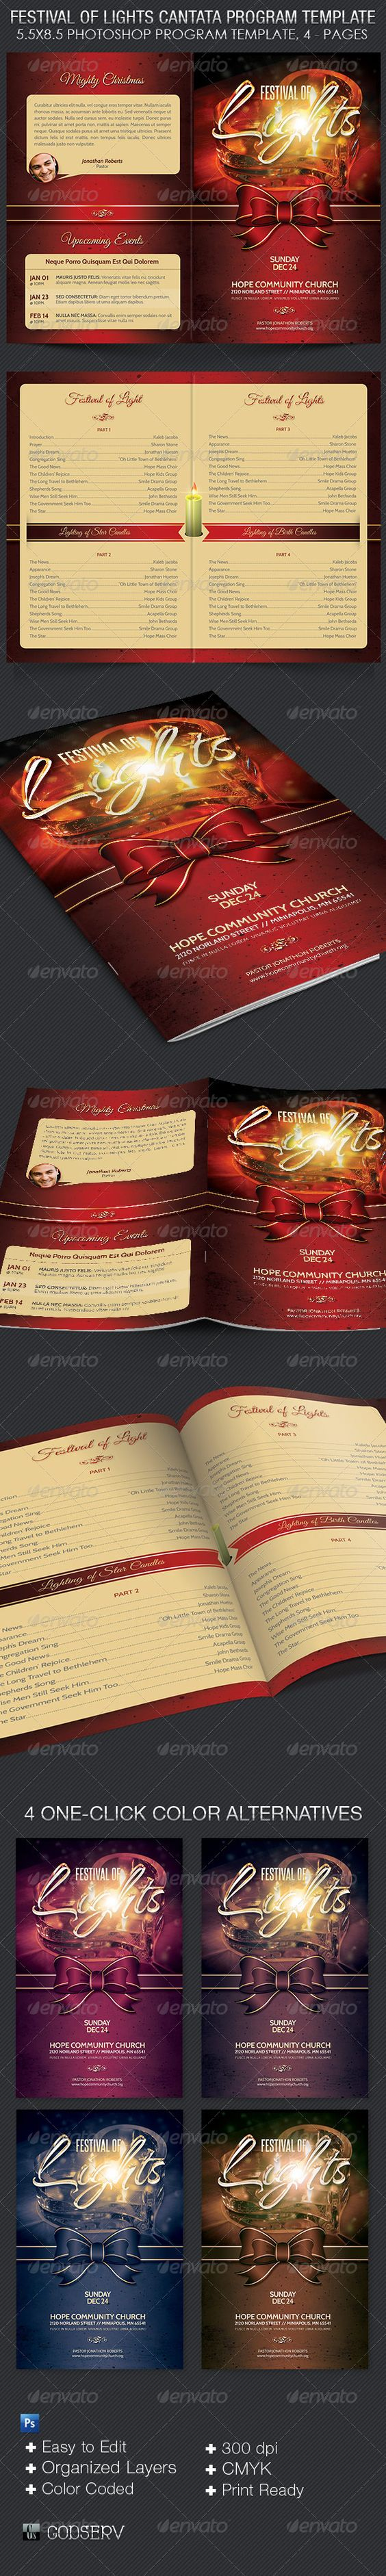 festival of lights christmas program template program template festival of lights christmas program template informational brochures